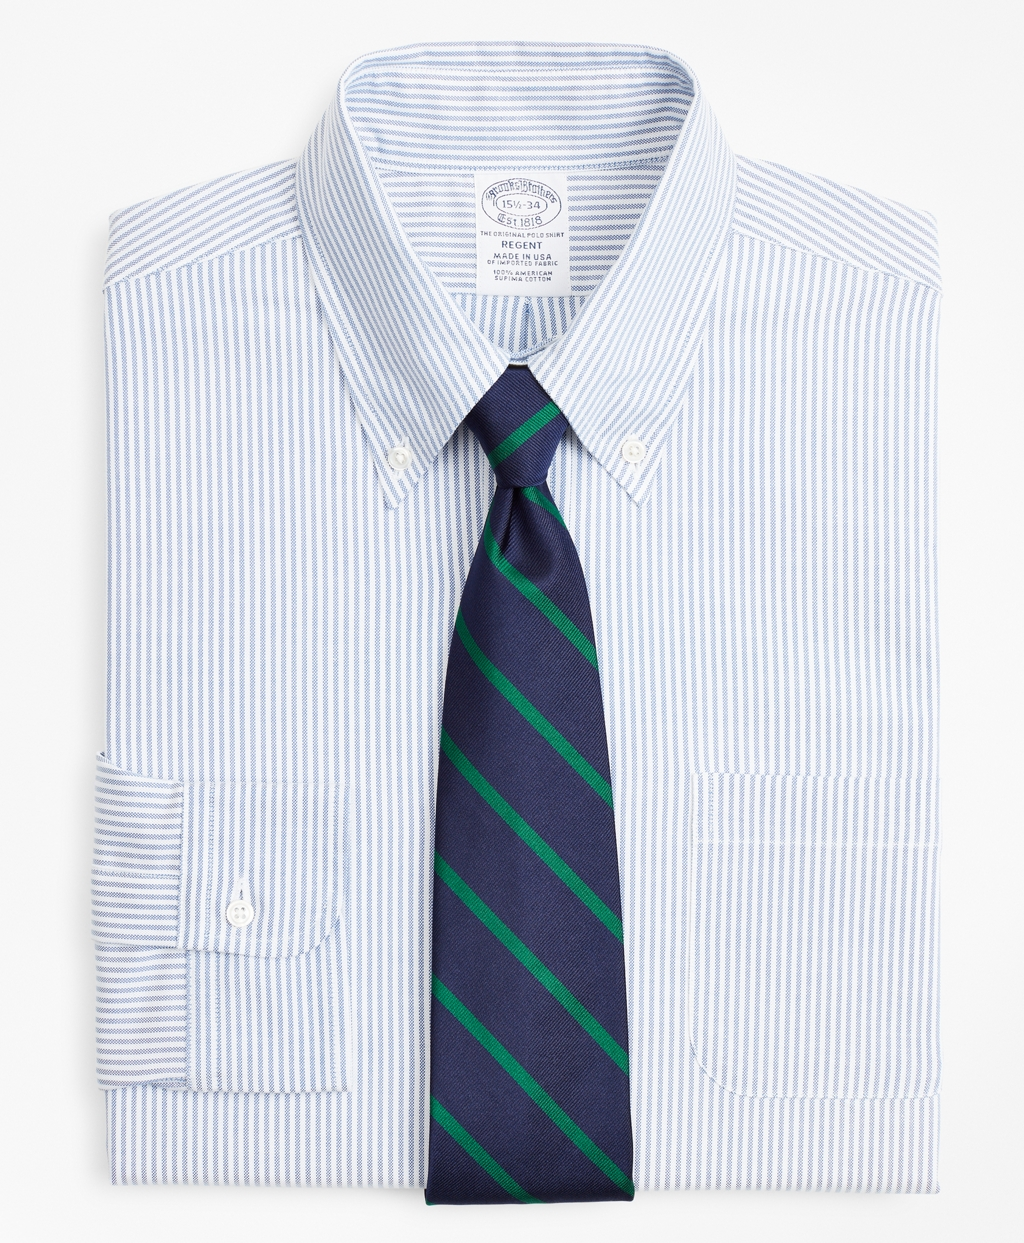 1920s Men's Dress Shirts Brooks Brothers Mens Original Polo Button-Down Oxford Slim Fitted Dress Shirt Stripe $140.00 AT vintagedancer.com